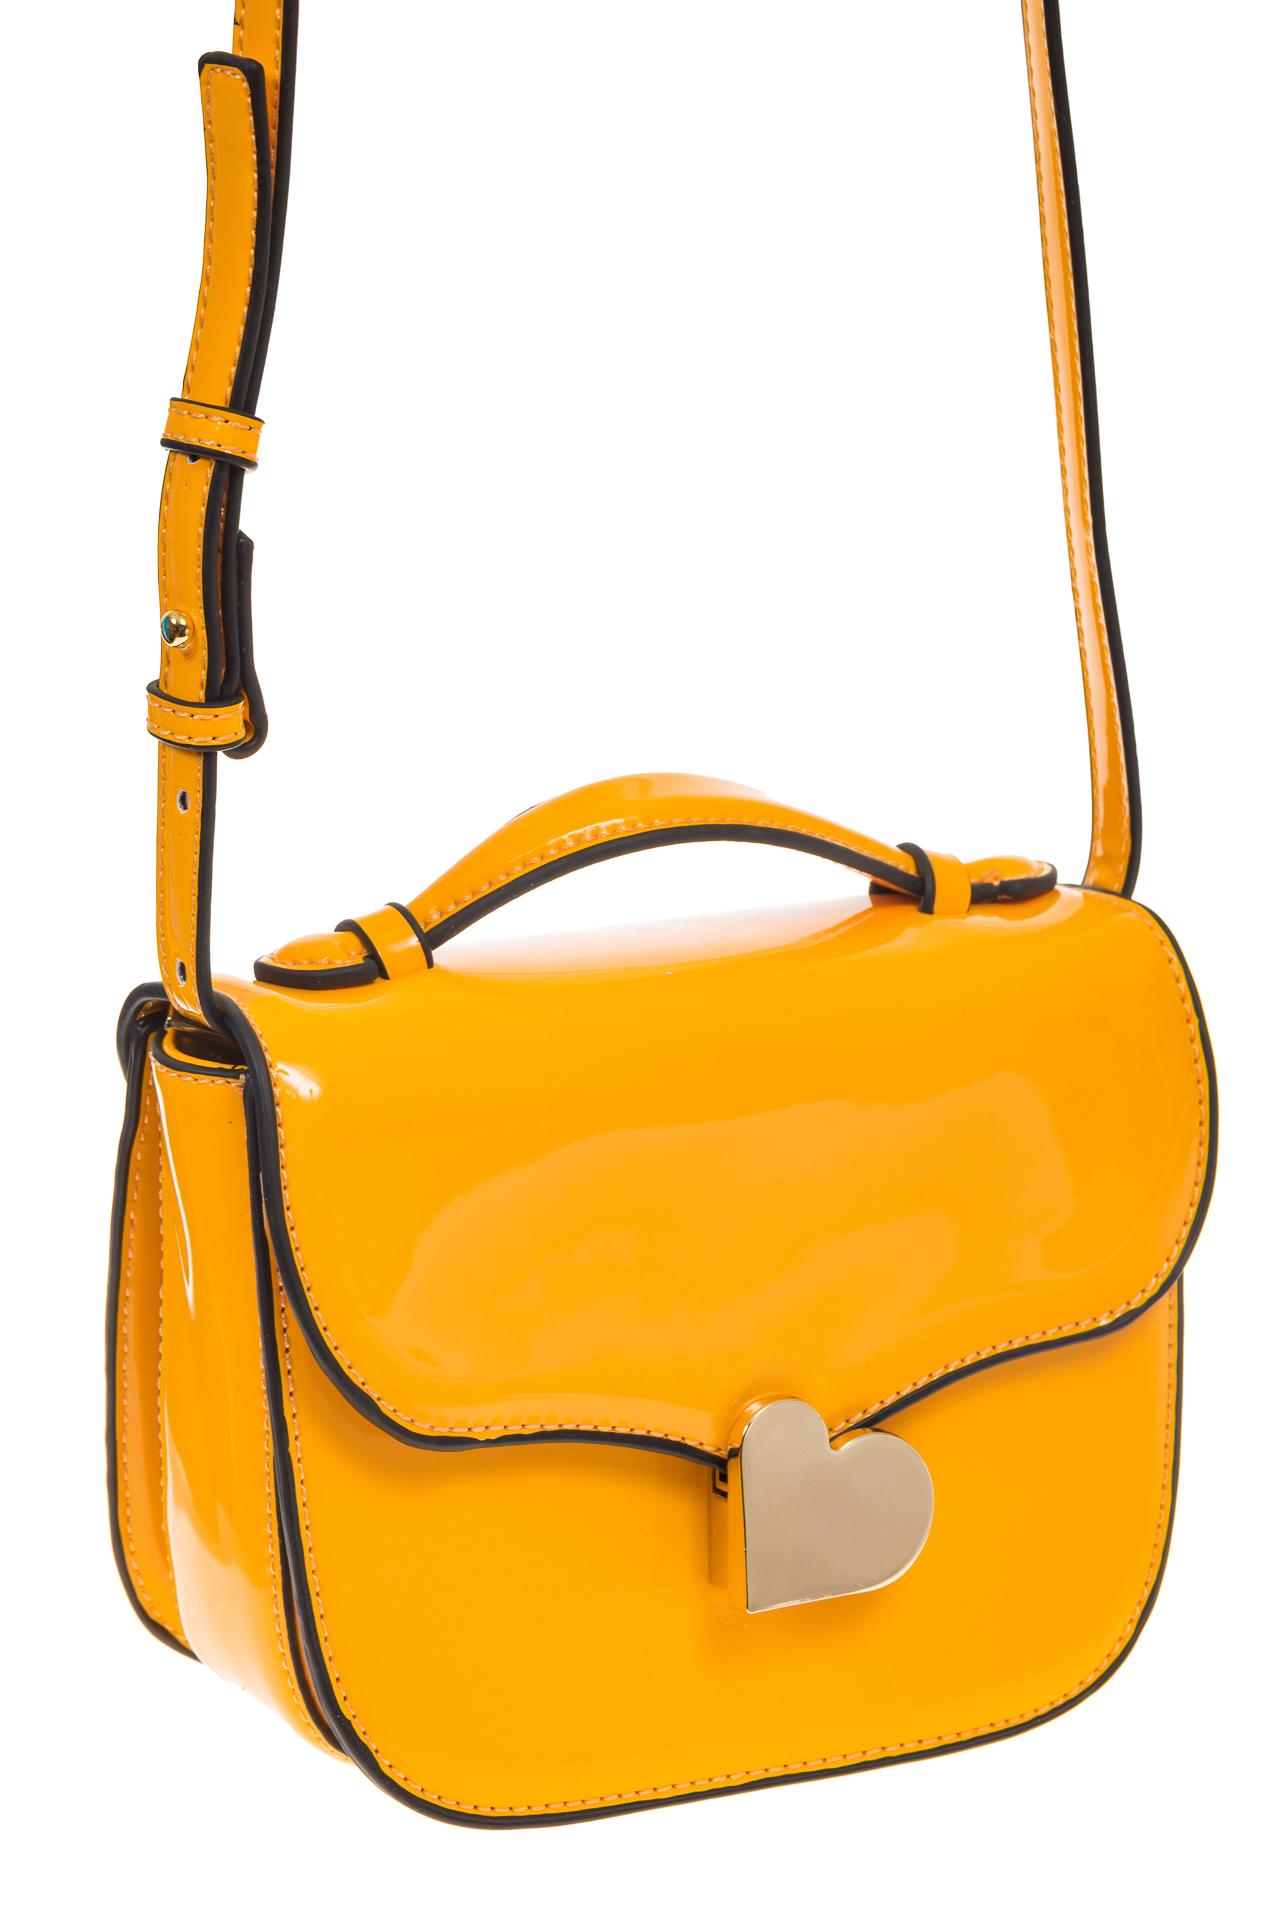 на фото Лаковая сумка с замком-сердечко цвета манго 6239